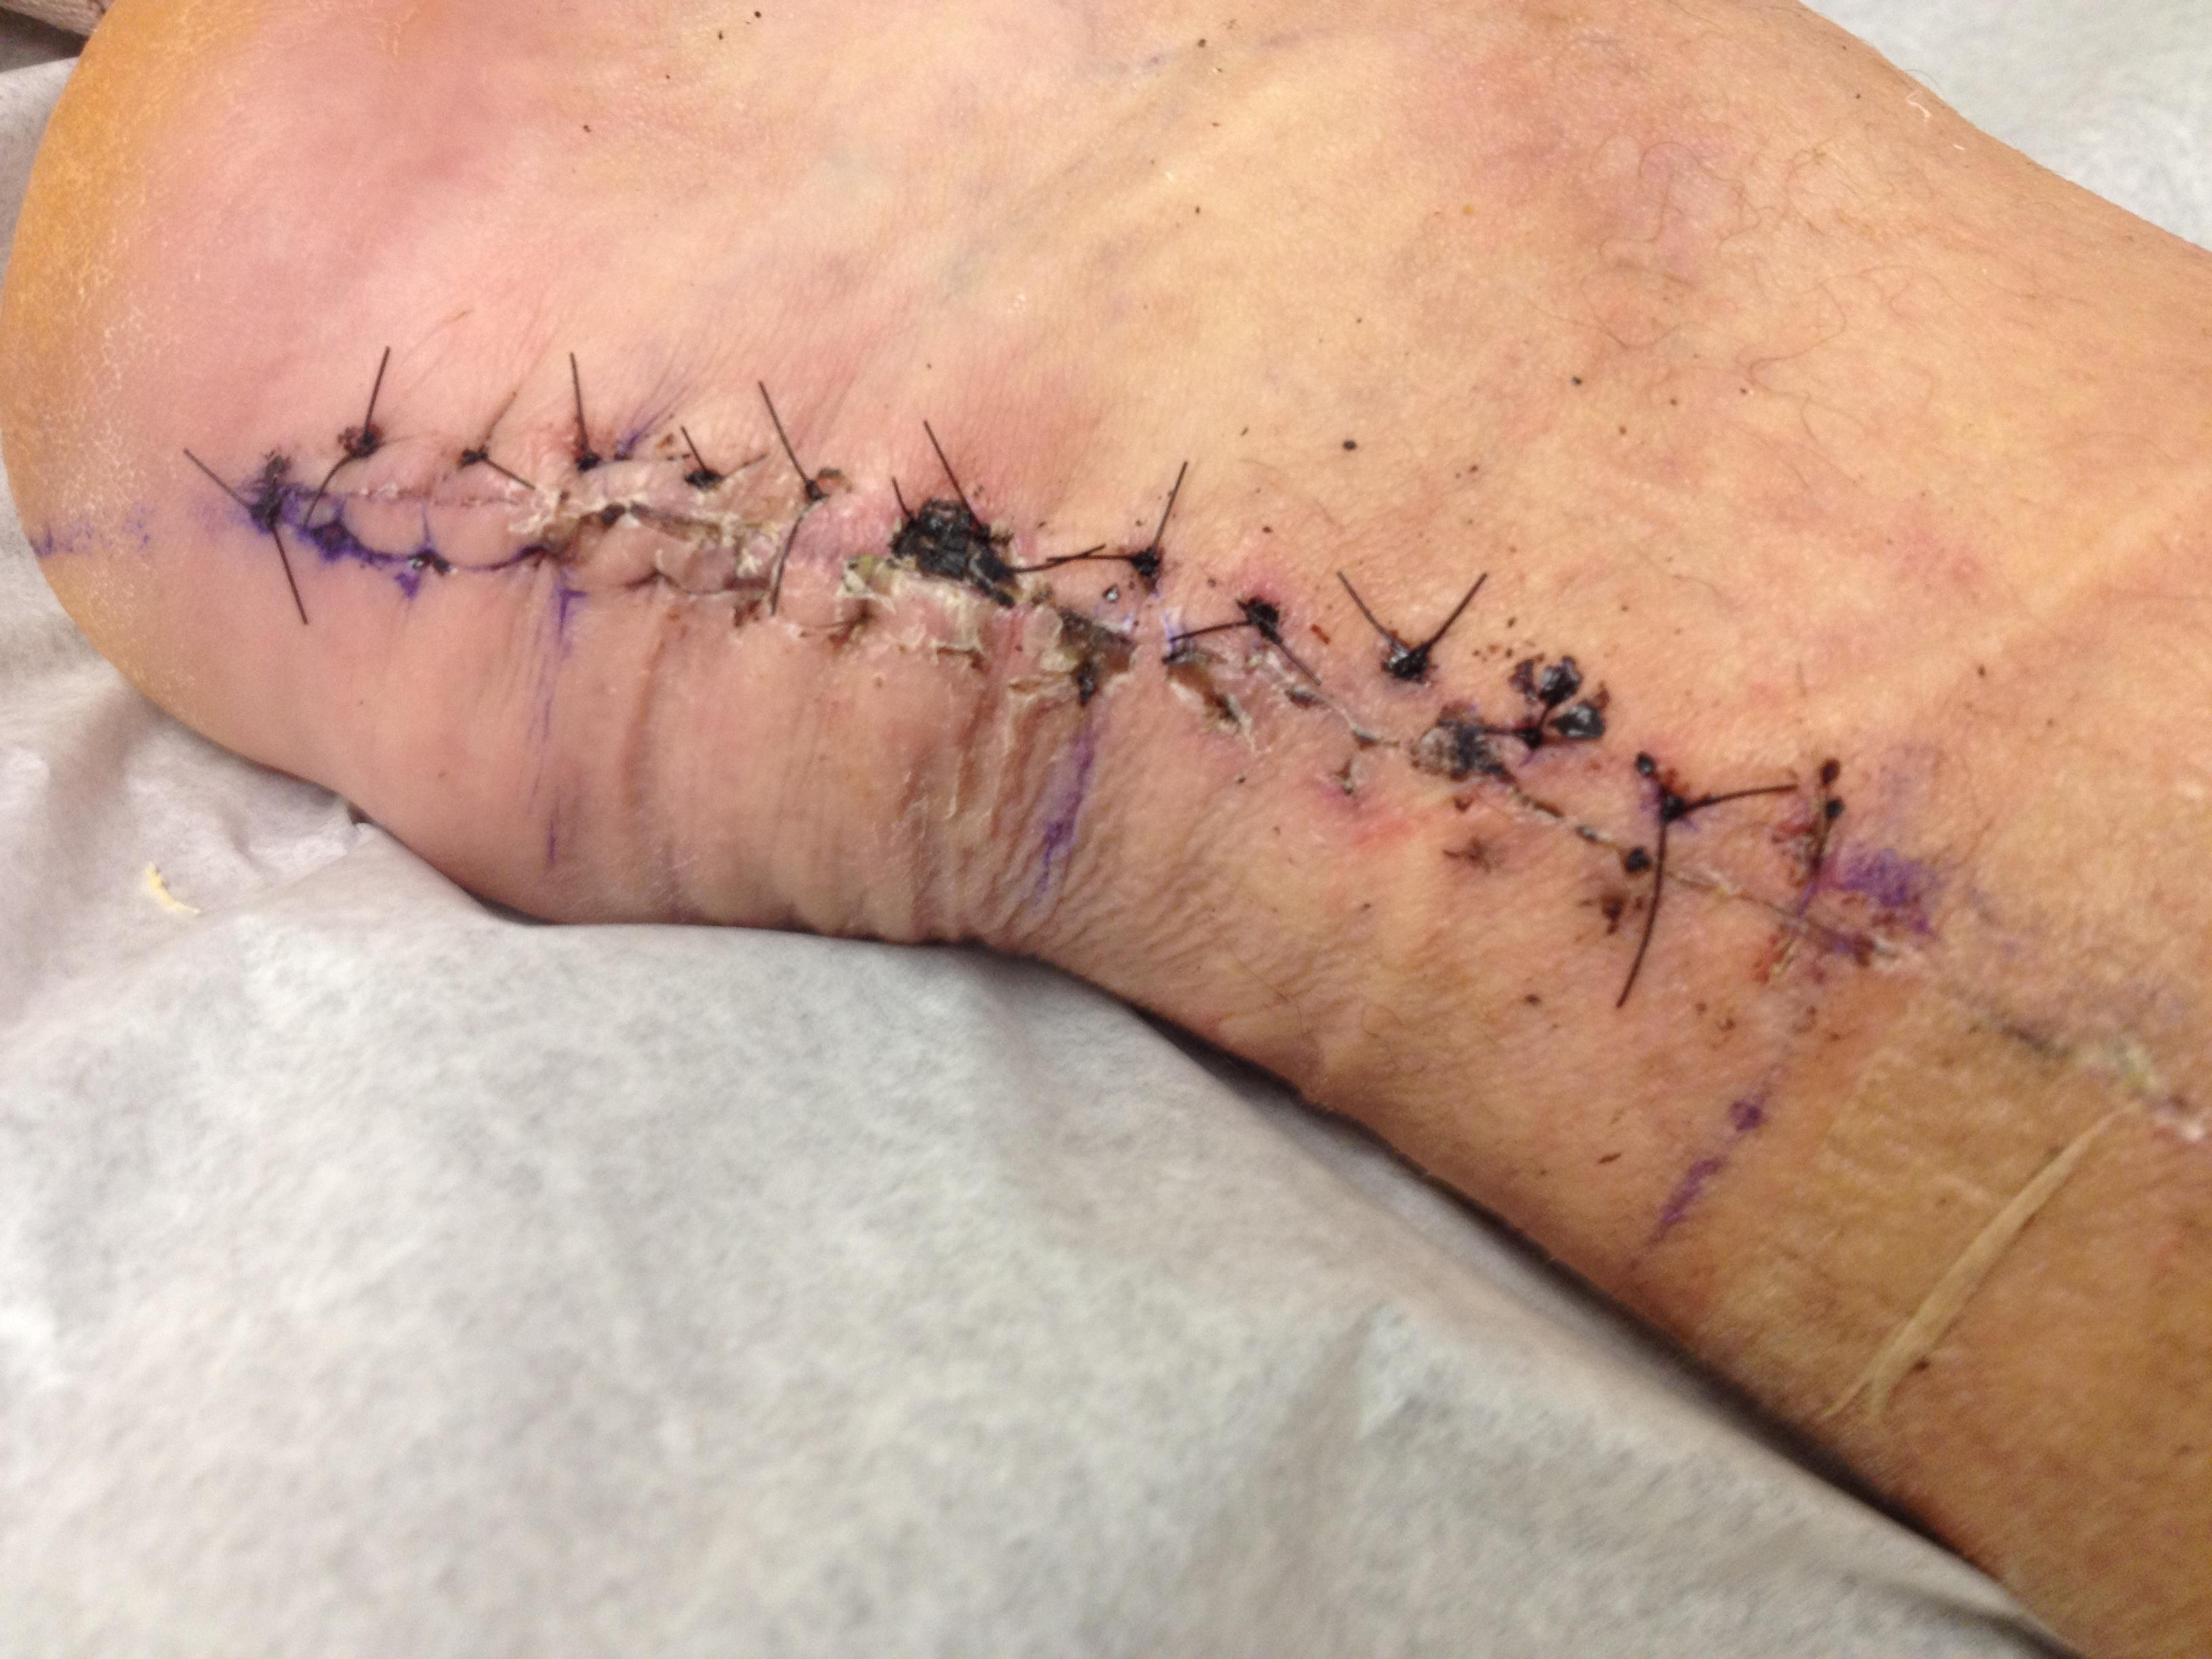 pics of stitches